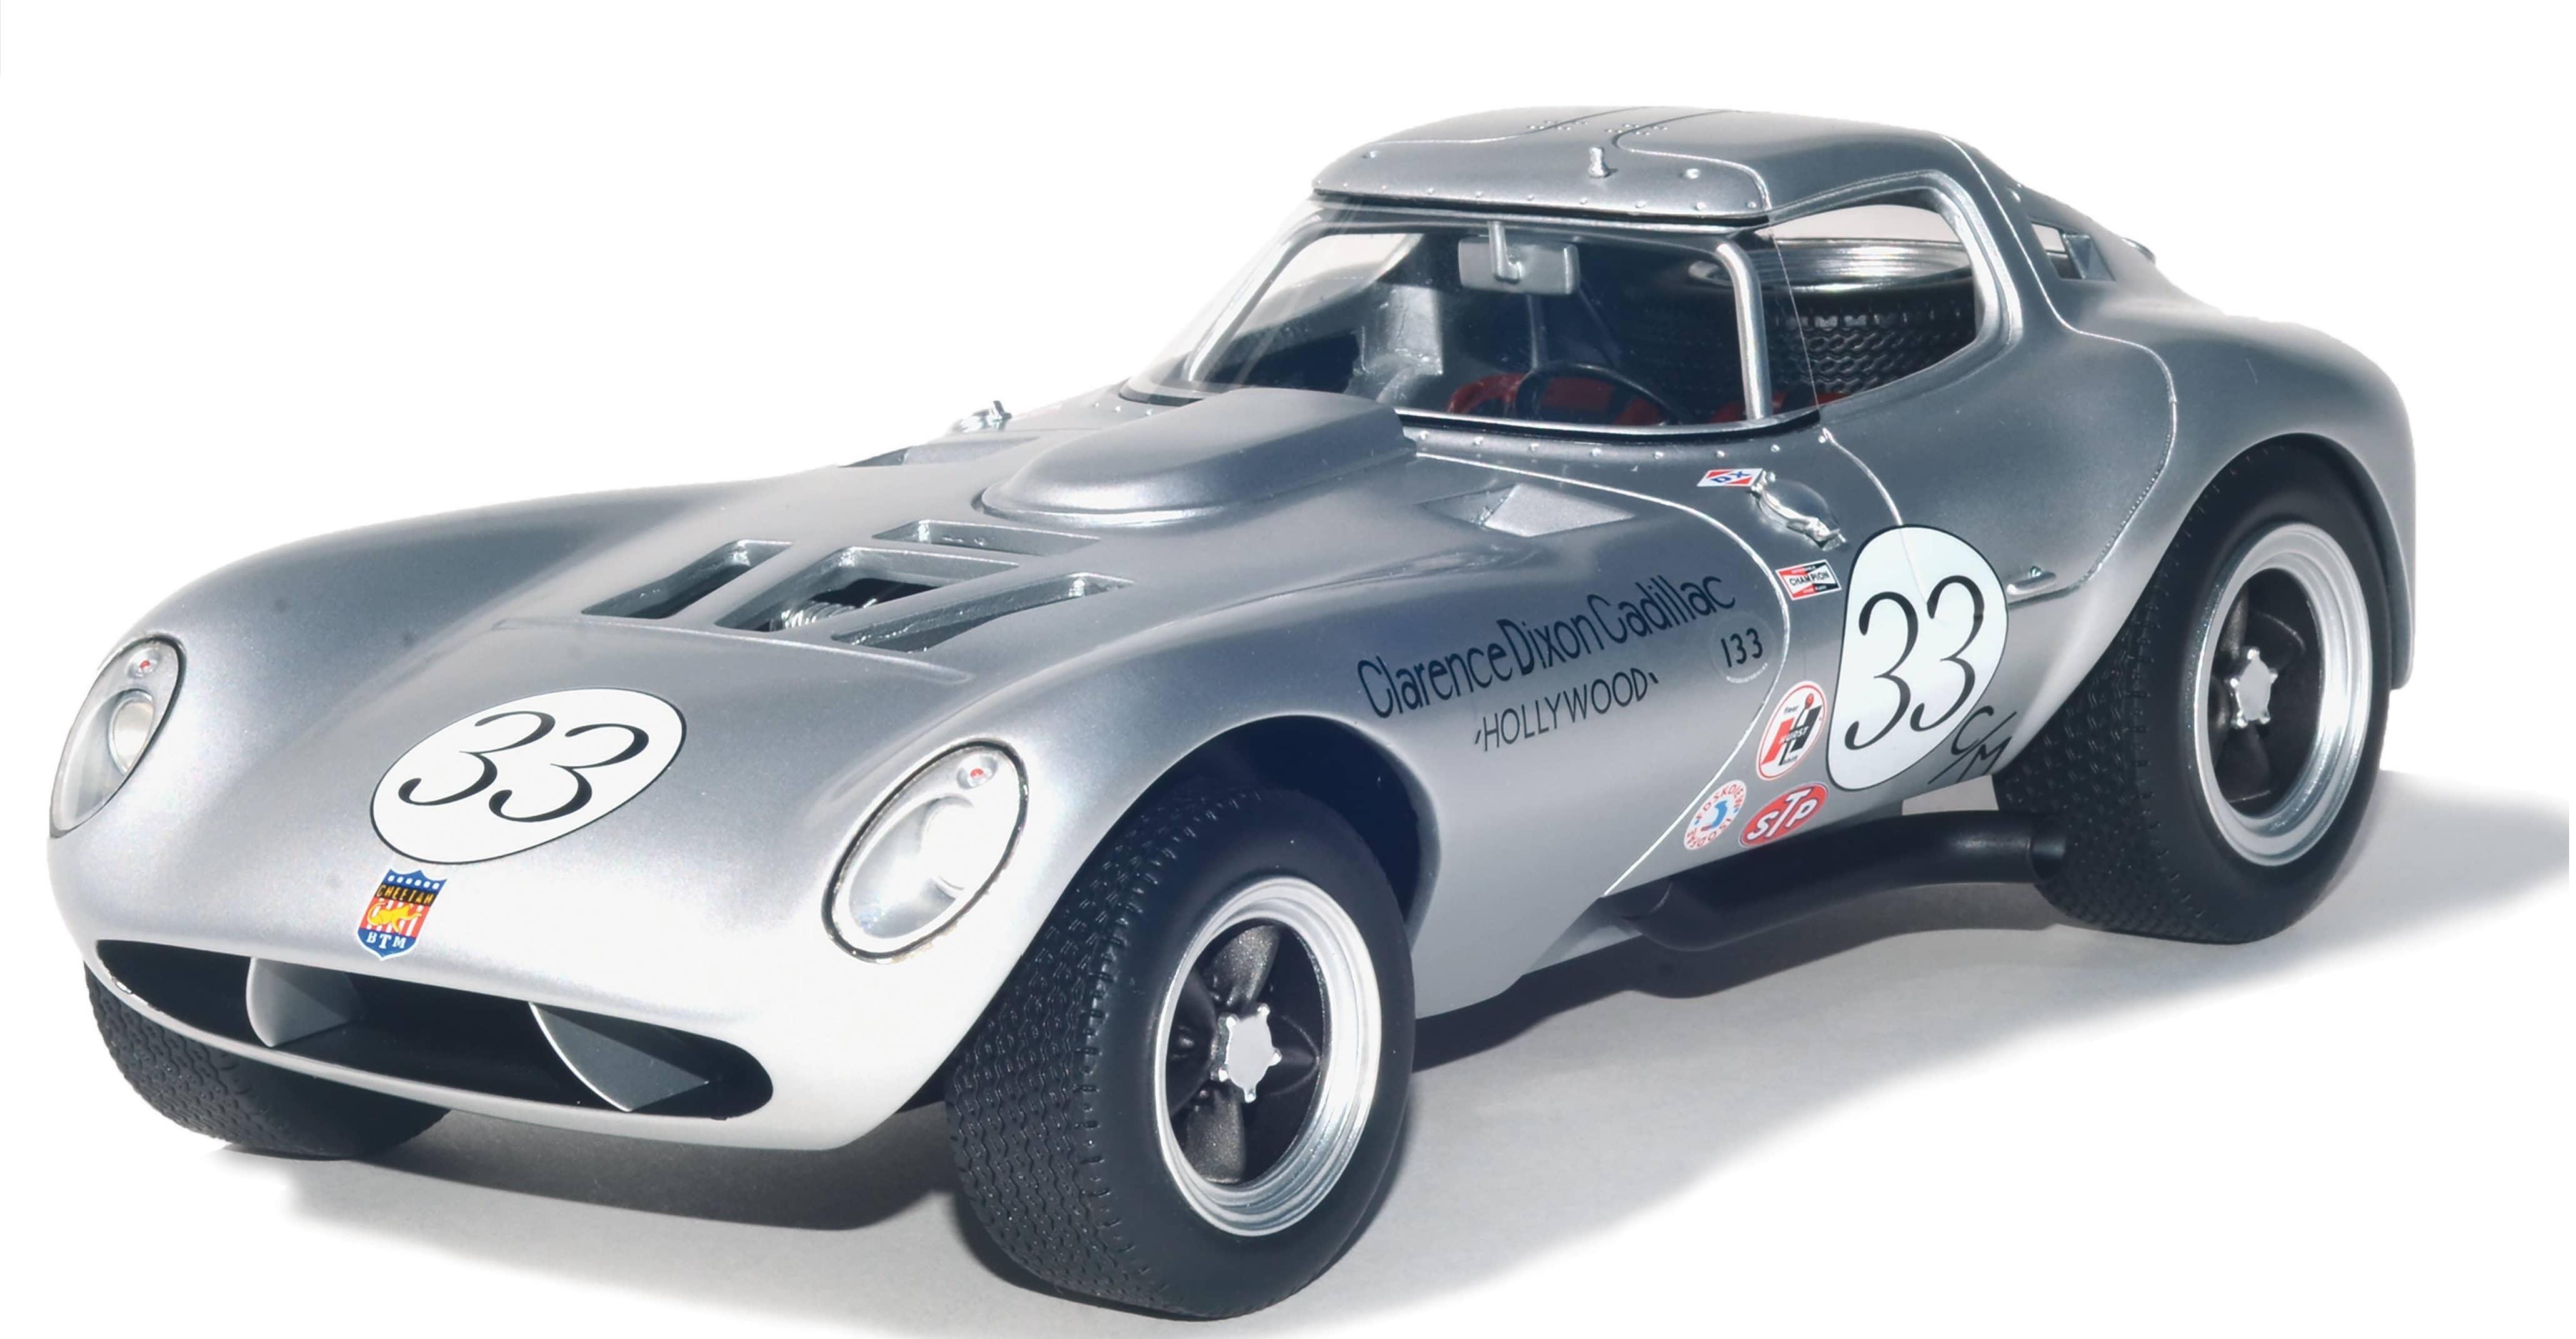 Replicarz: 1964 Cheetah Team Clarence Dixon Cadillac No. 33